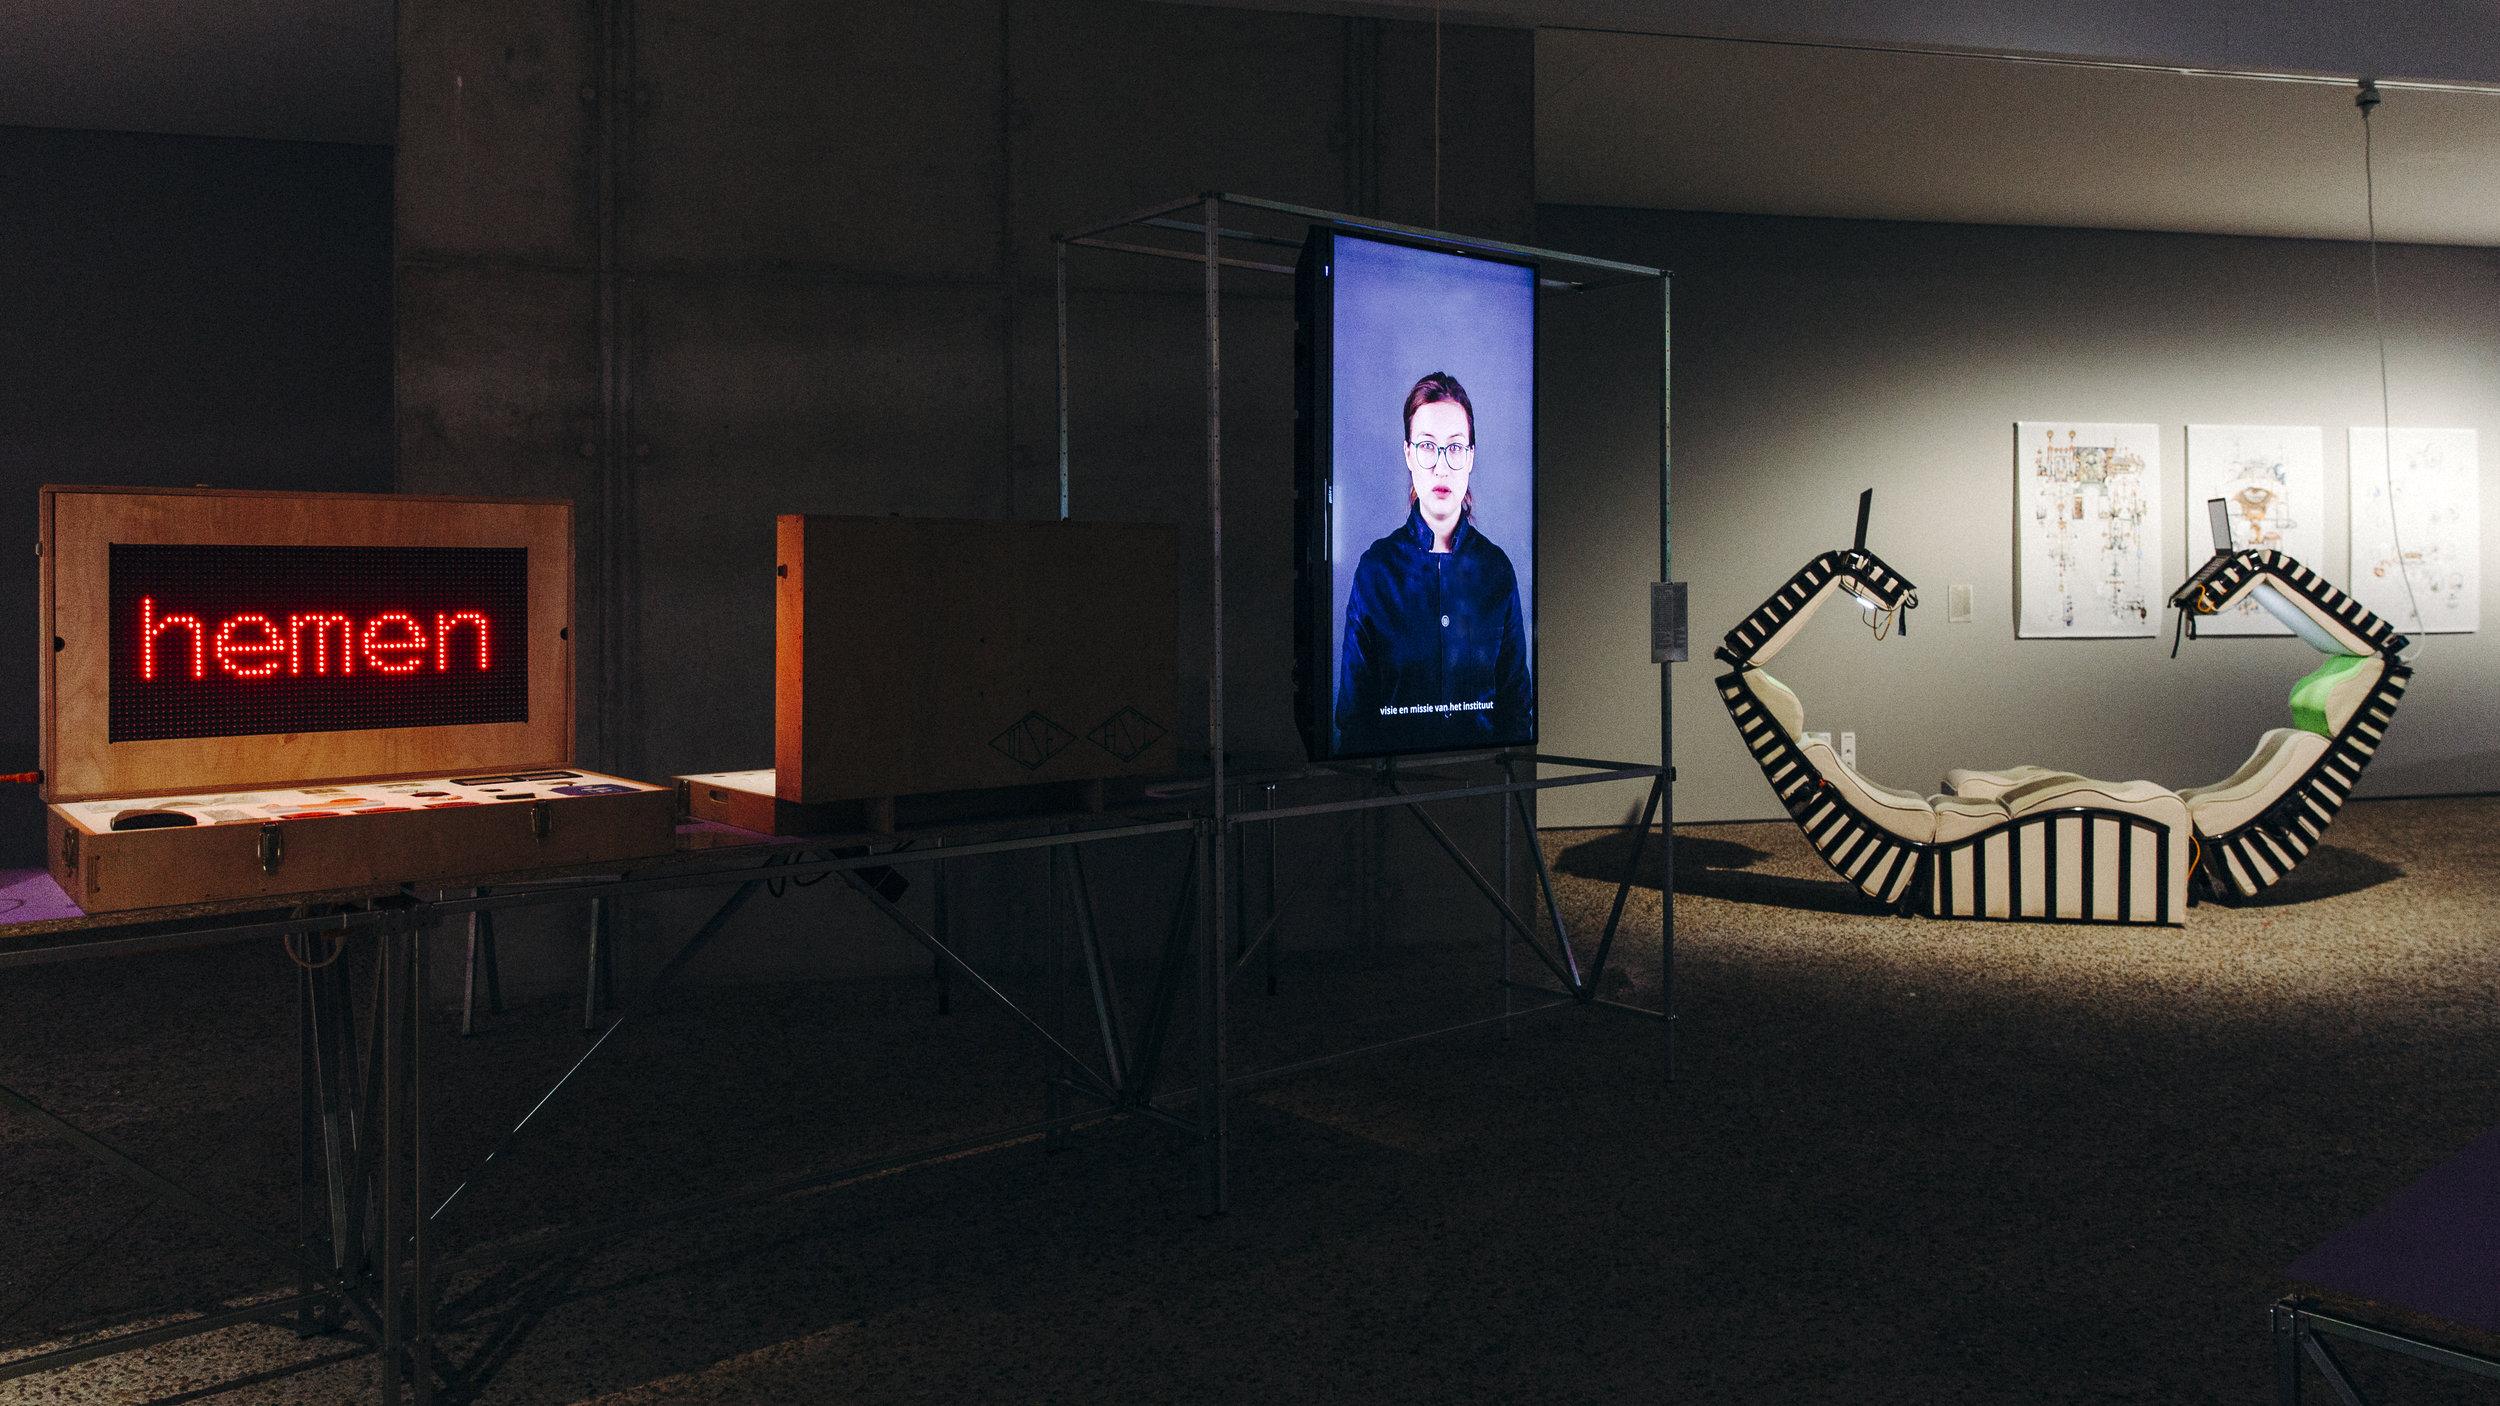 Installation view, A School of Schools, C-Mine Genk, photo Selma Gurbuz